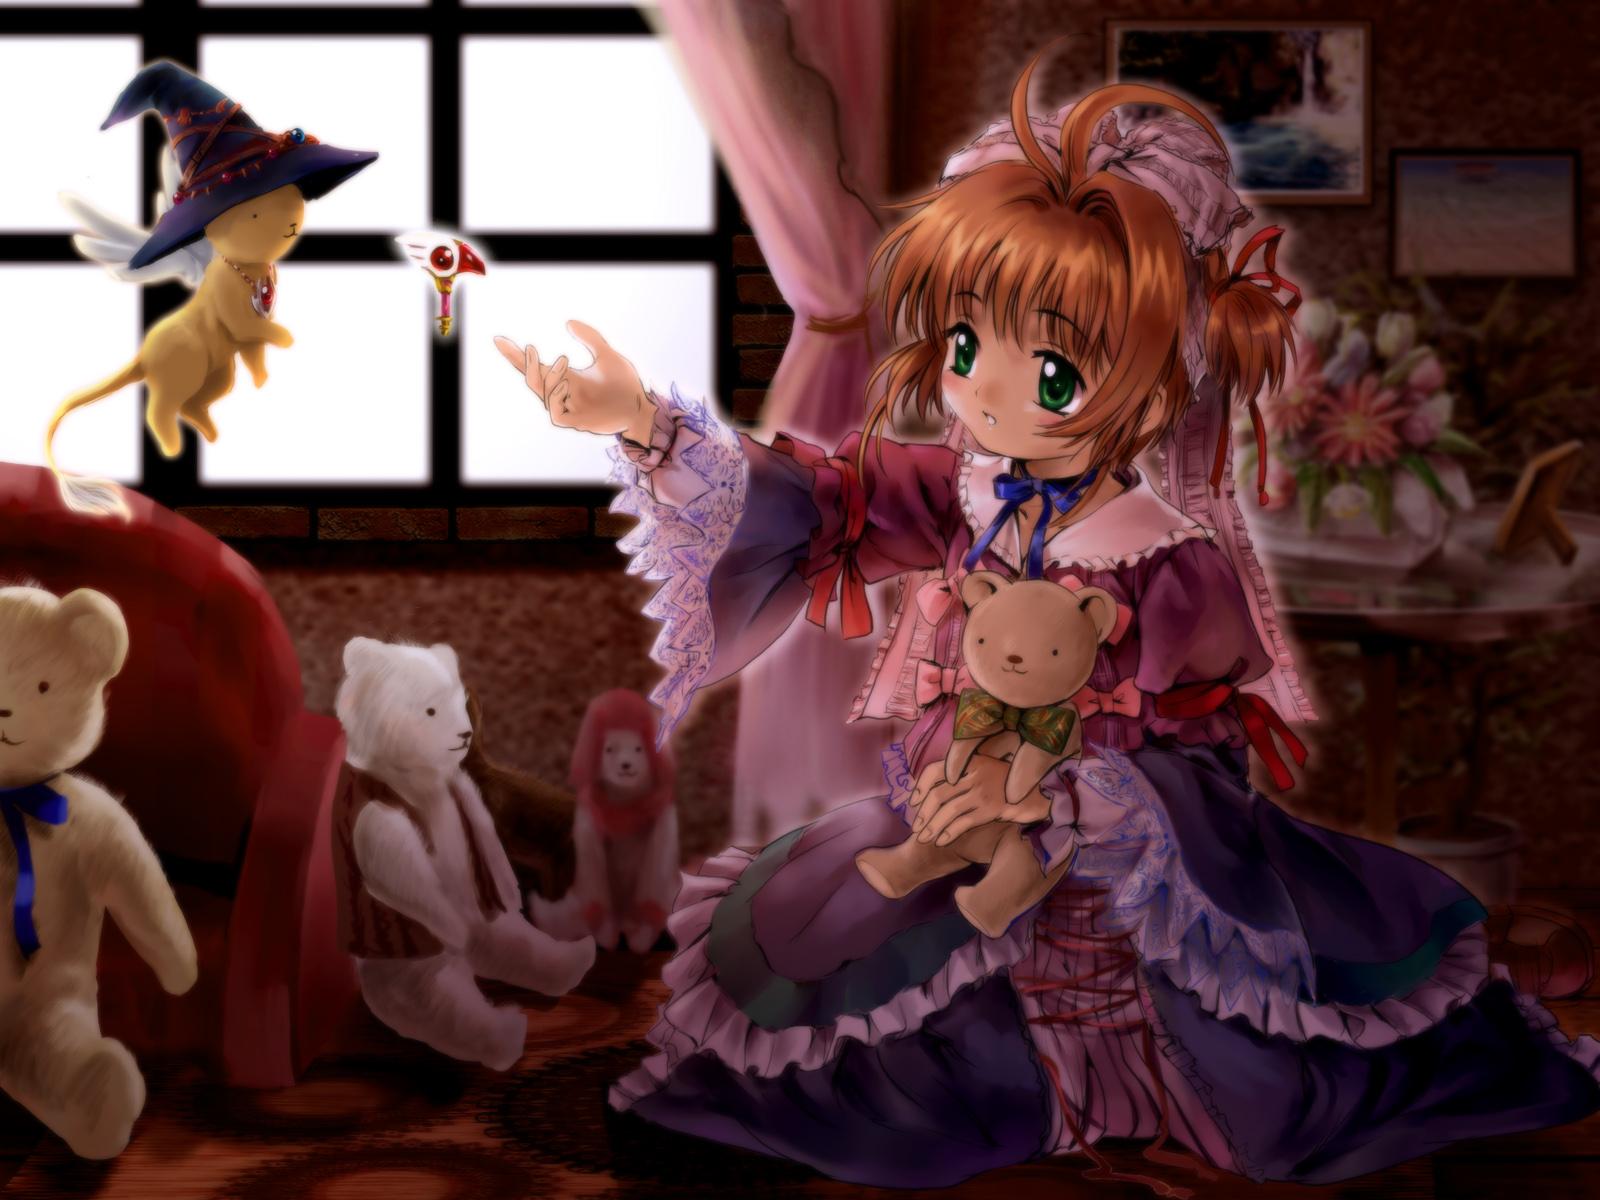 brown_hair card_captor_sakura dress green_eyes hat headdress kero kinomoto_sakura moonknives teddy_bear